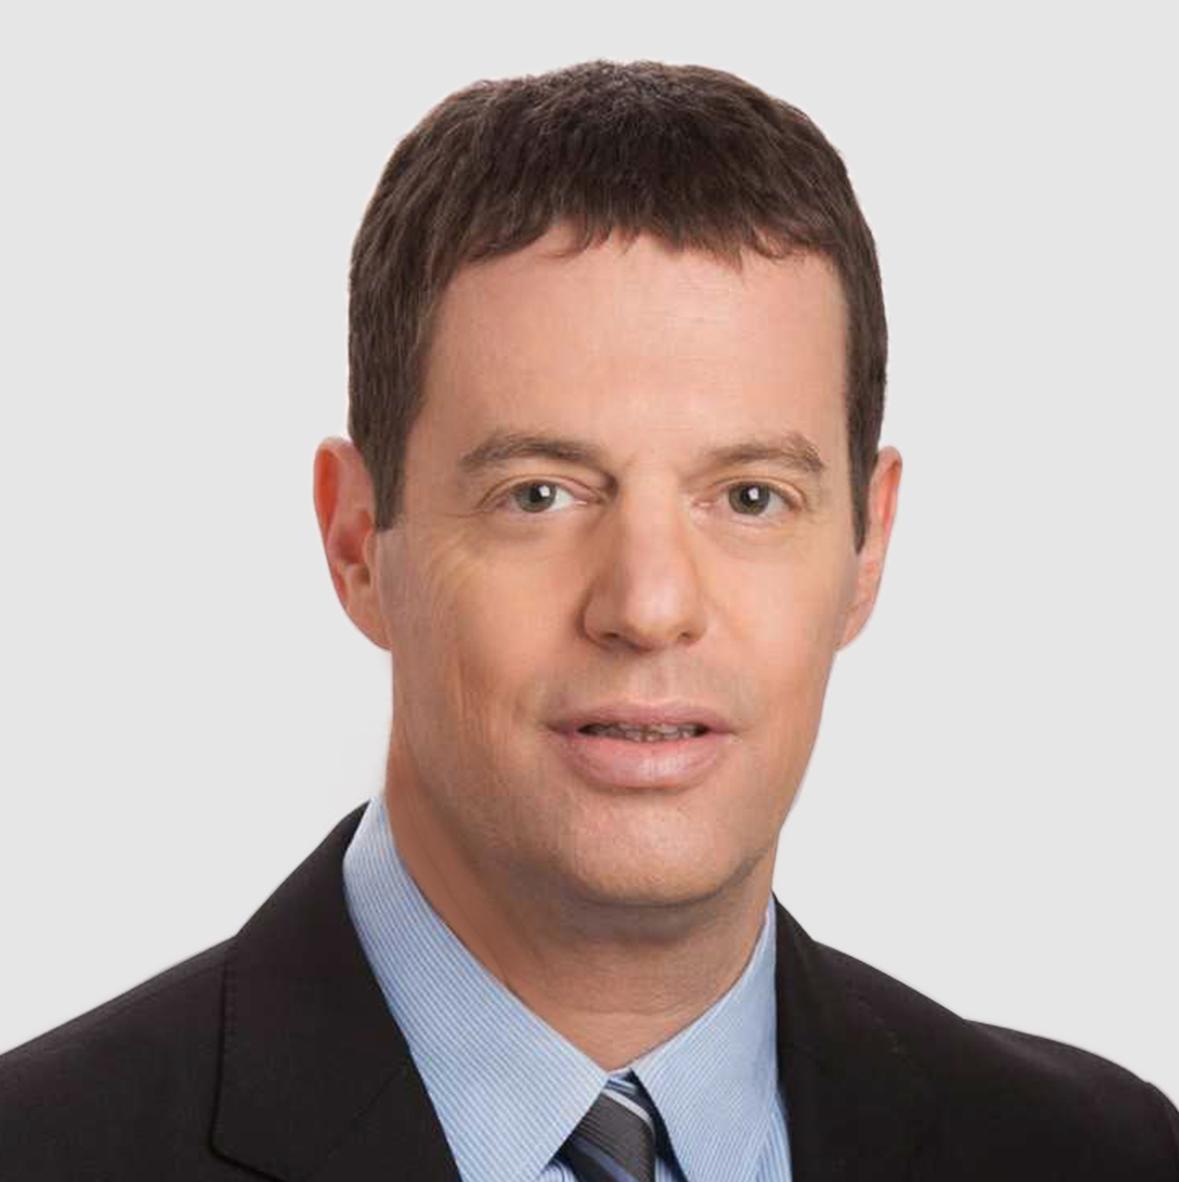 Rami Hadar,Board Member